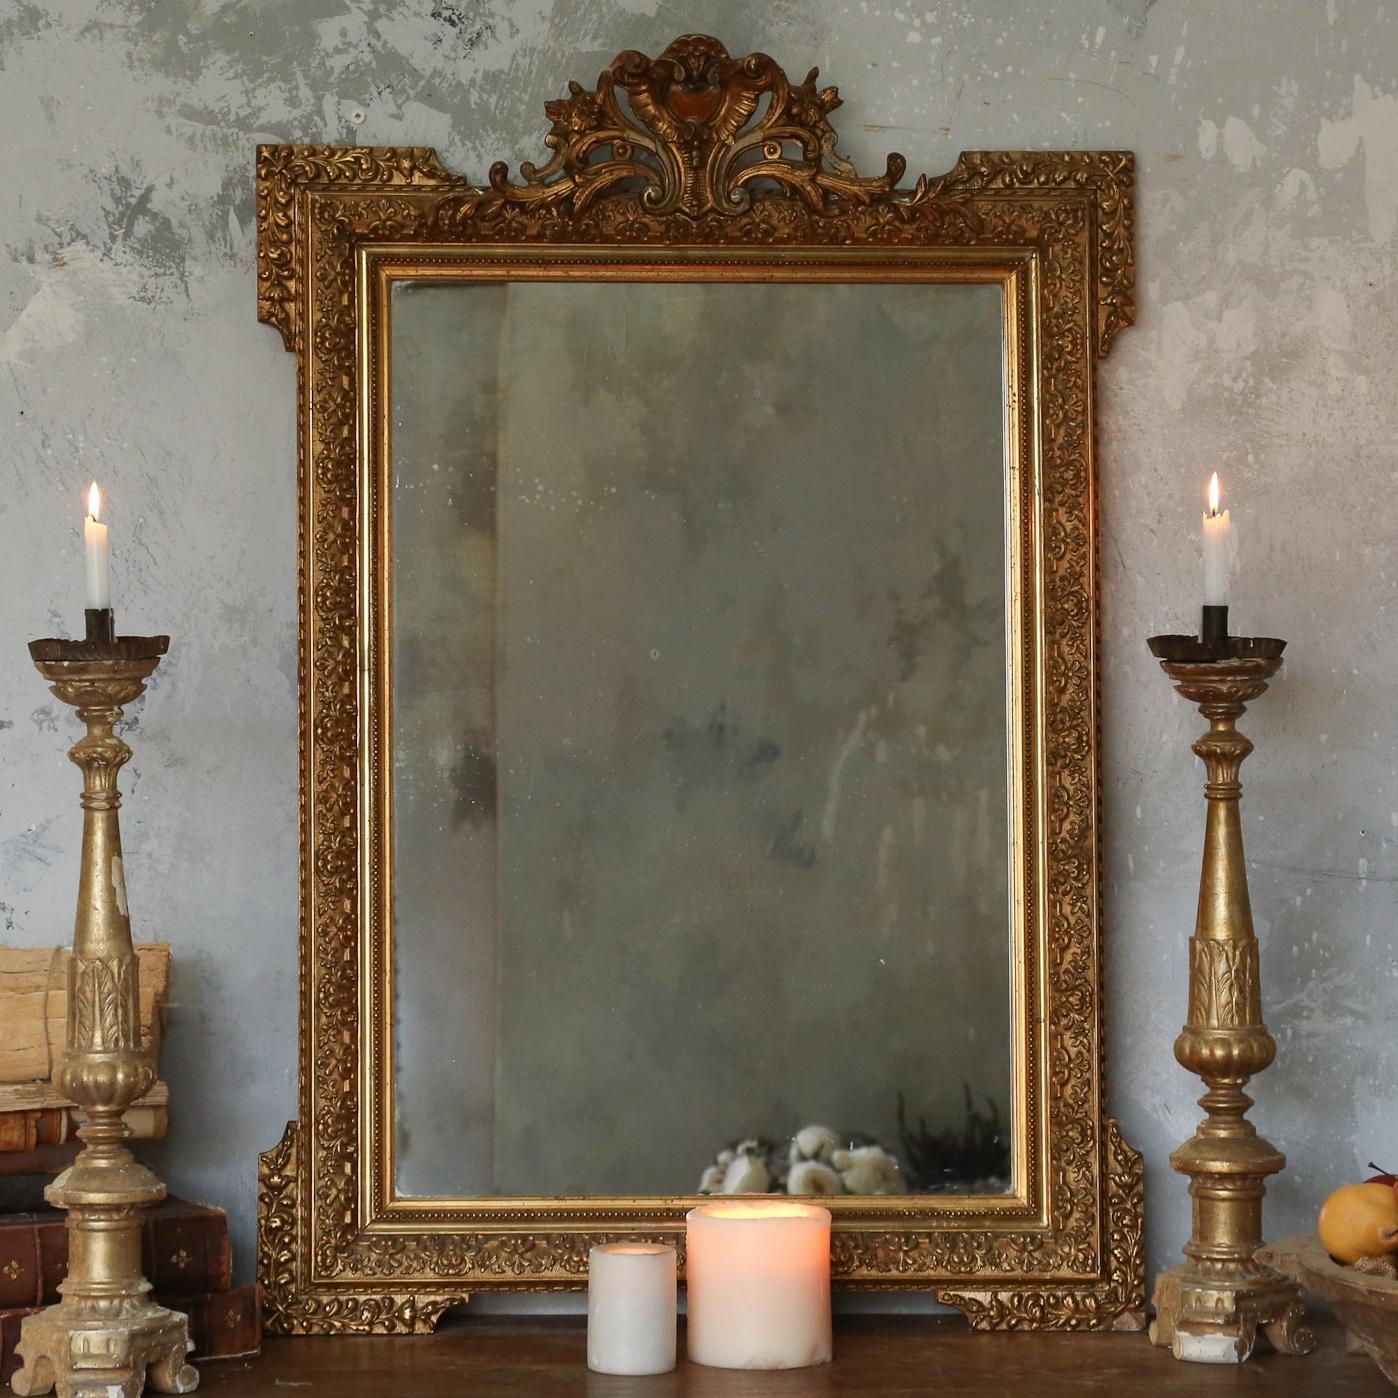 Where Buy Cheap Home Decor Online